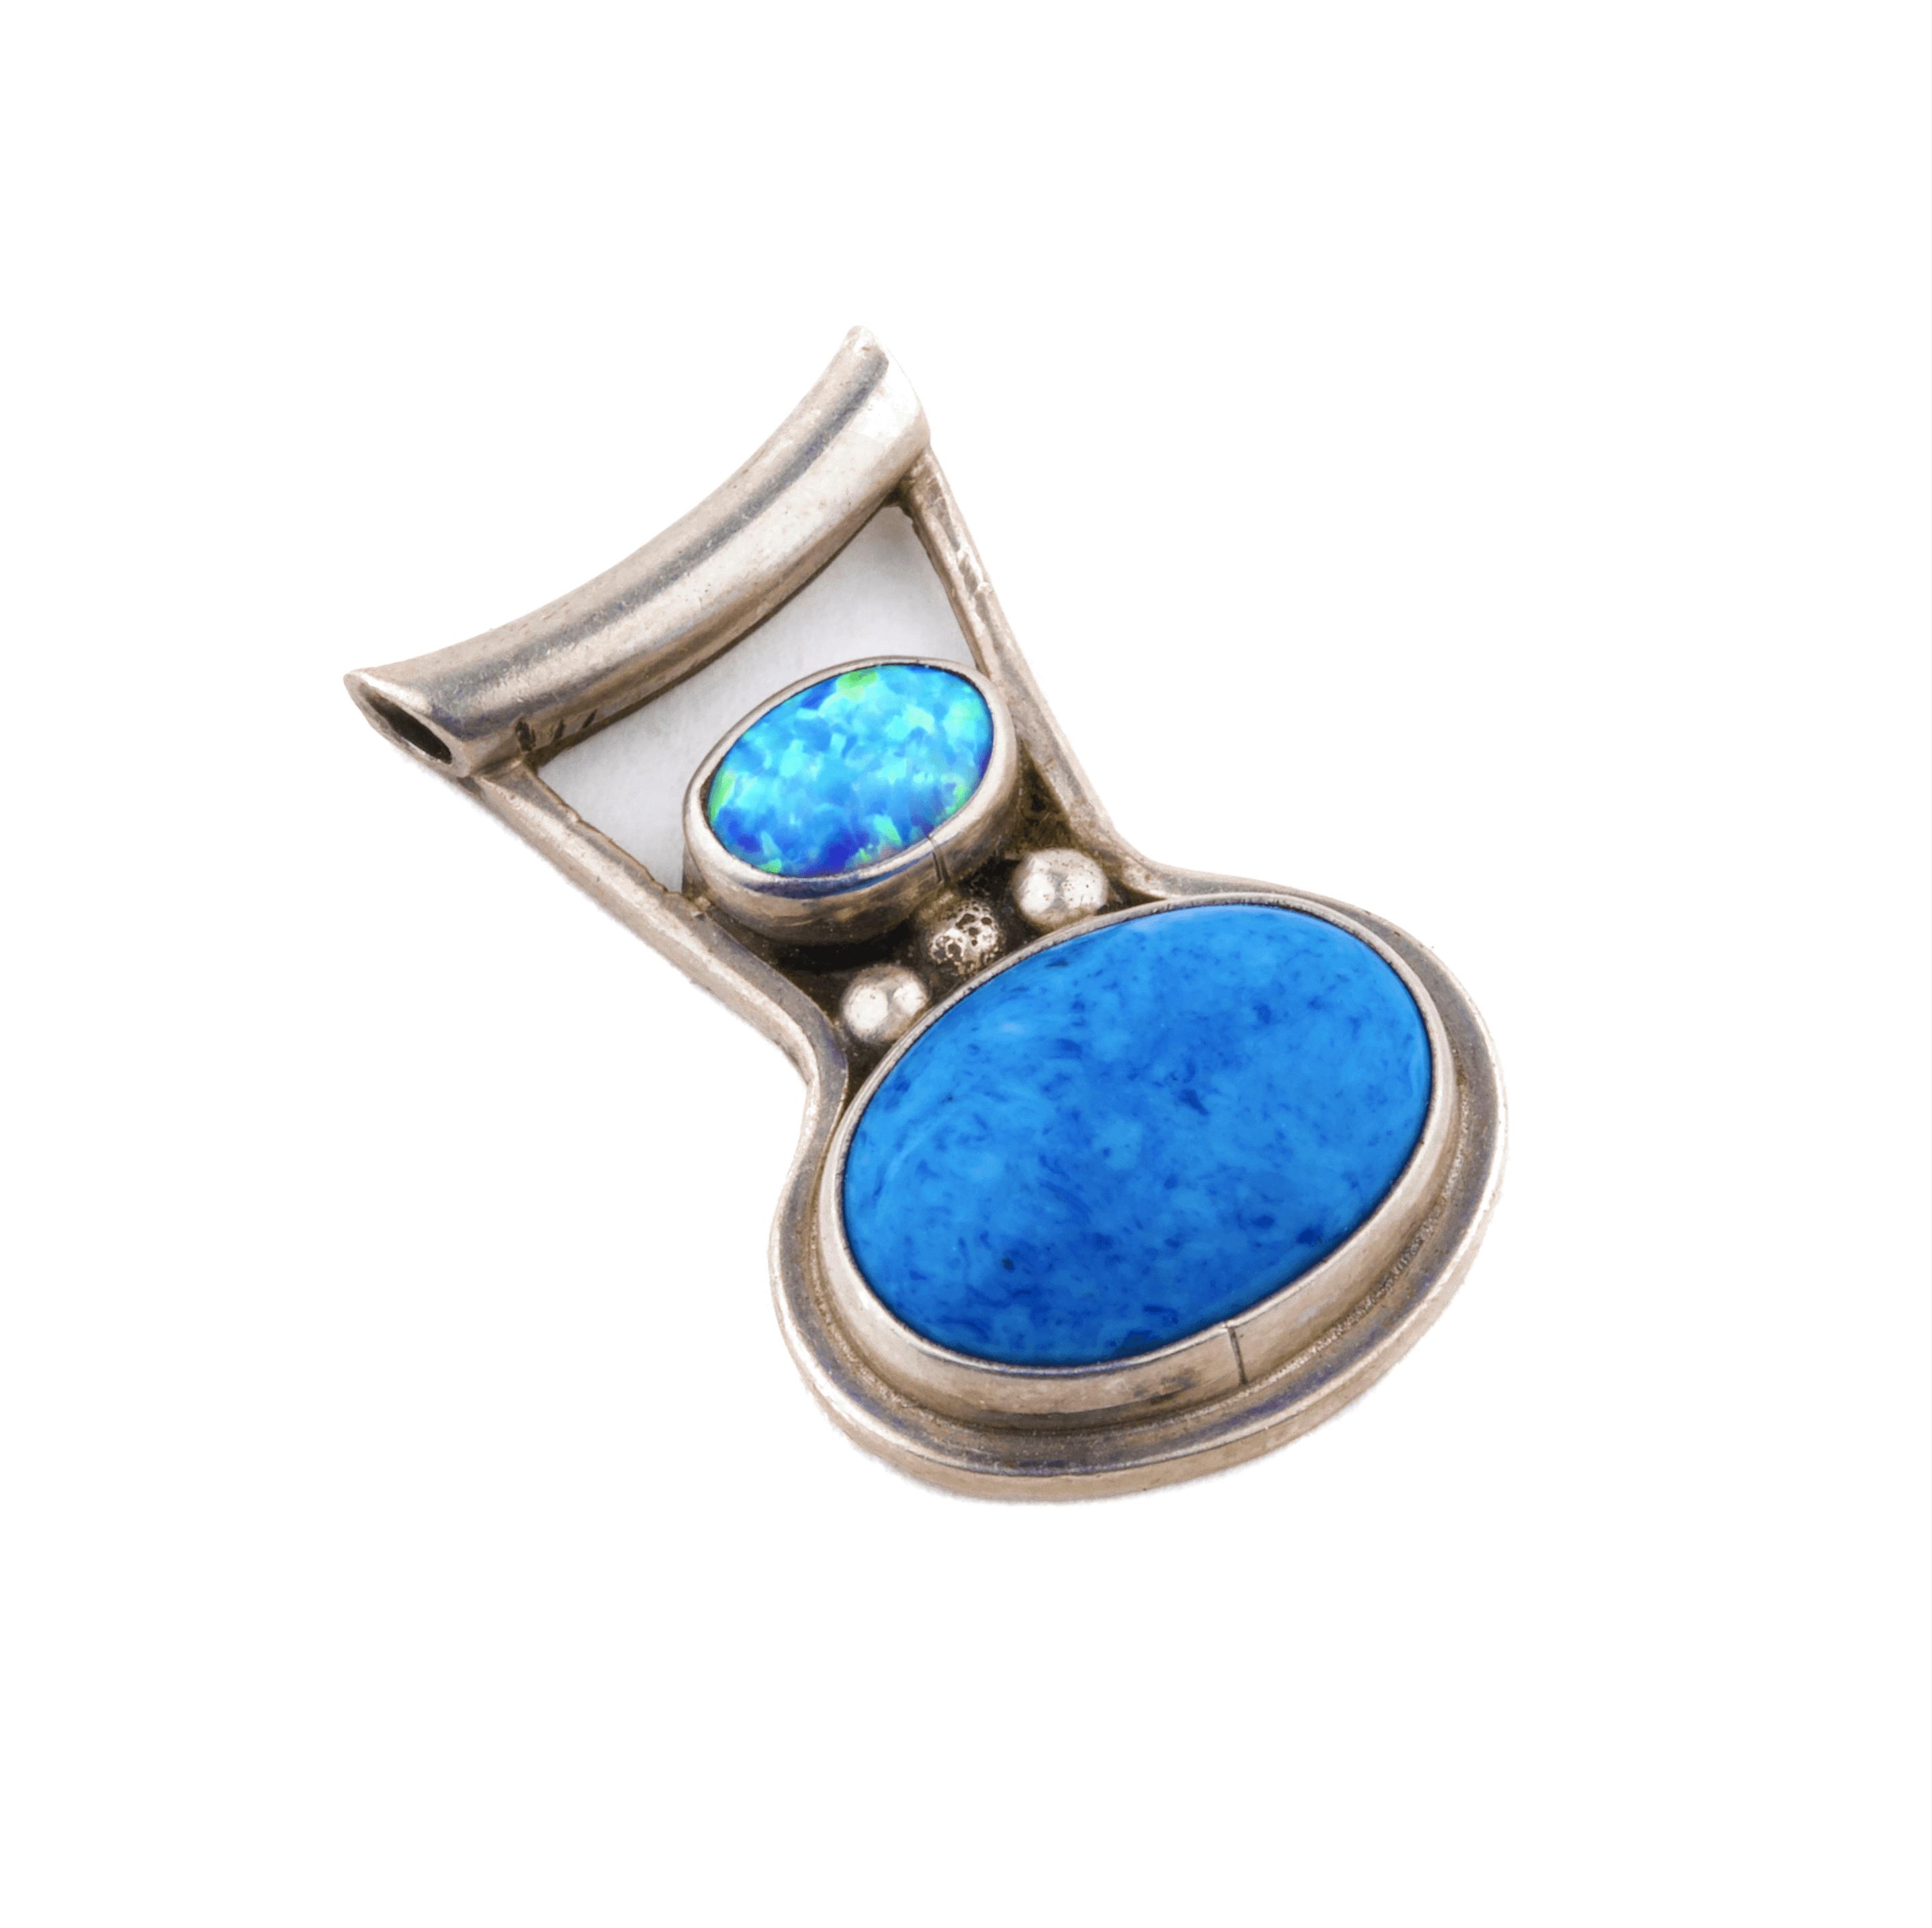 Vintage opal pendant silver jewelry